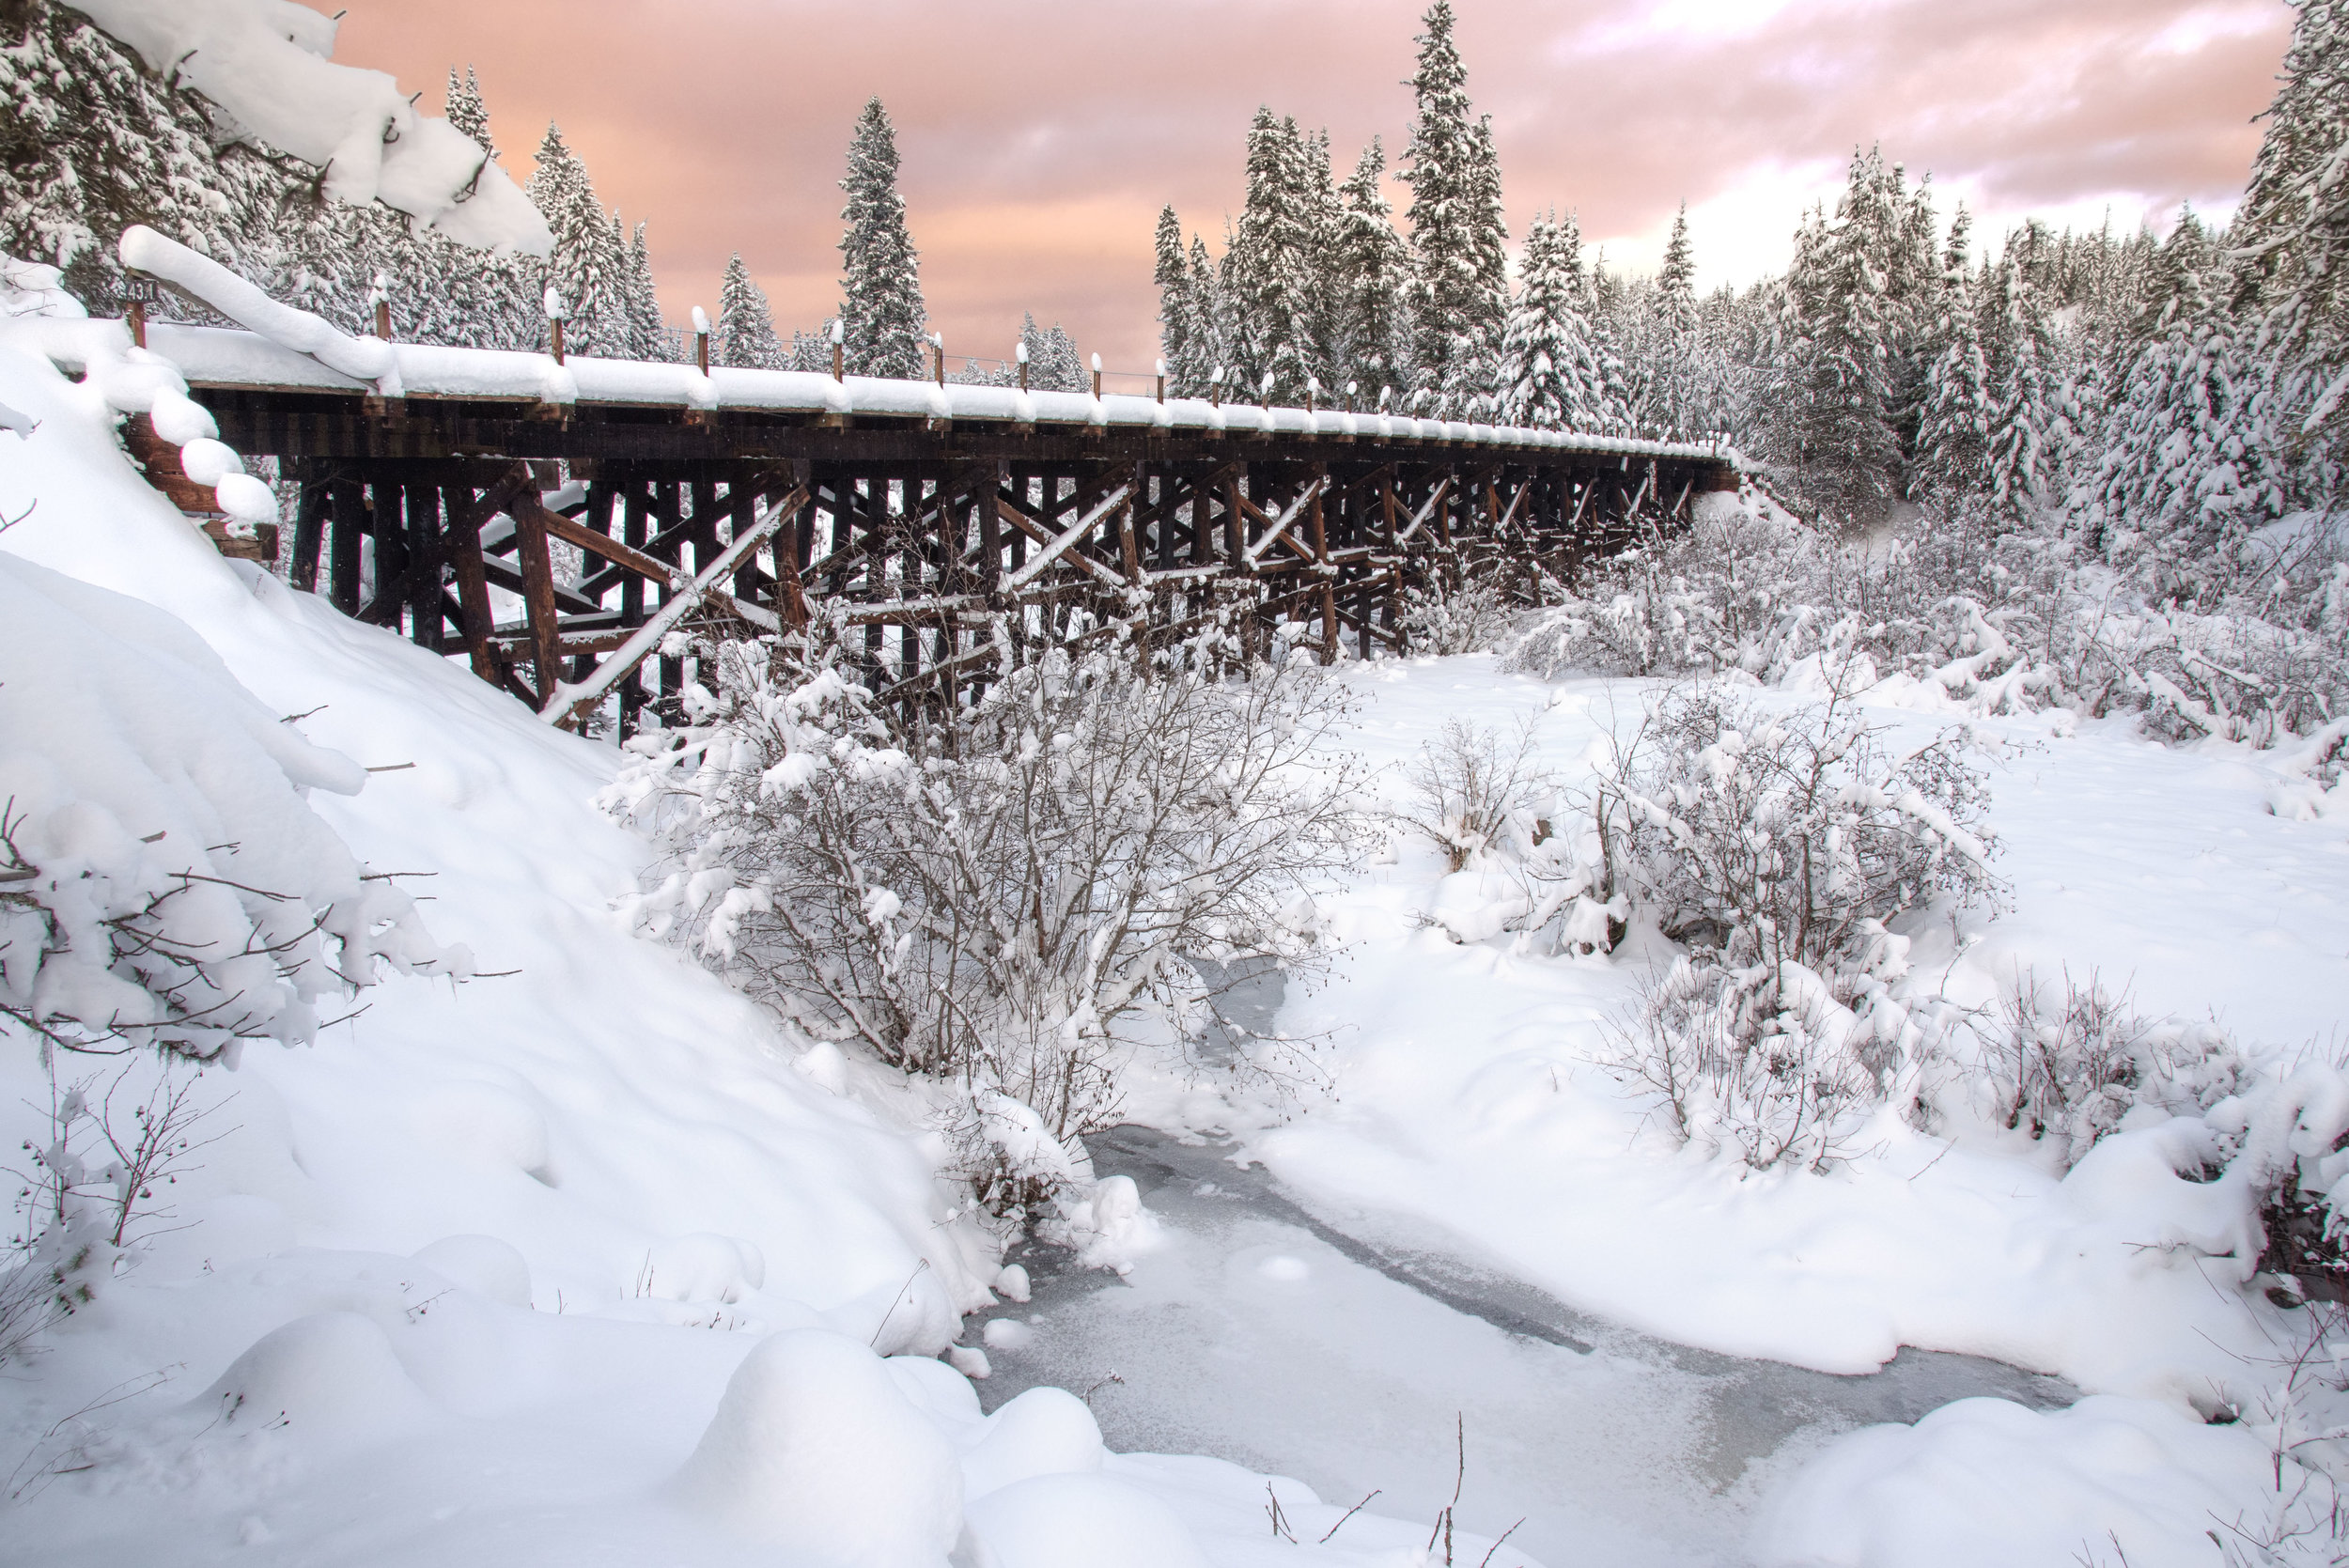 The Old Bridge in Winter